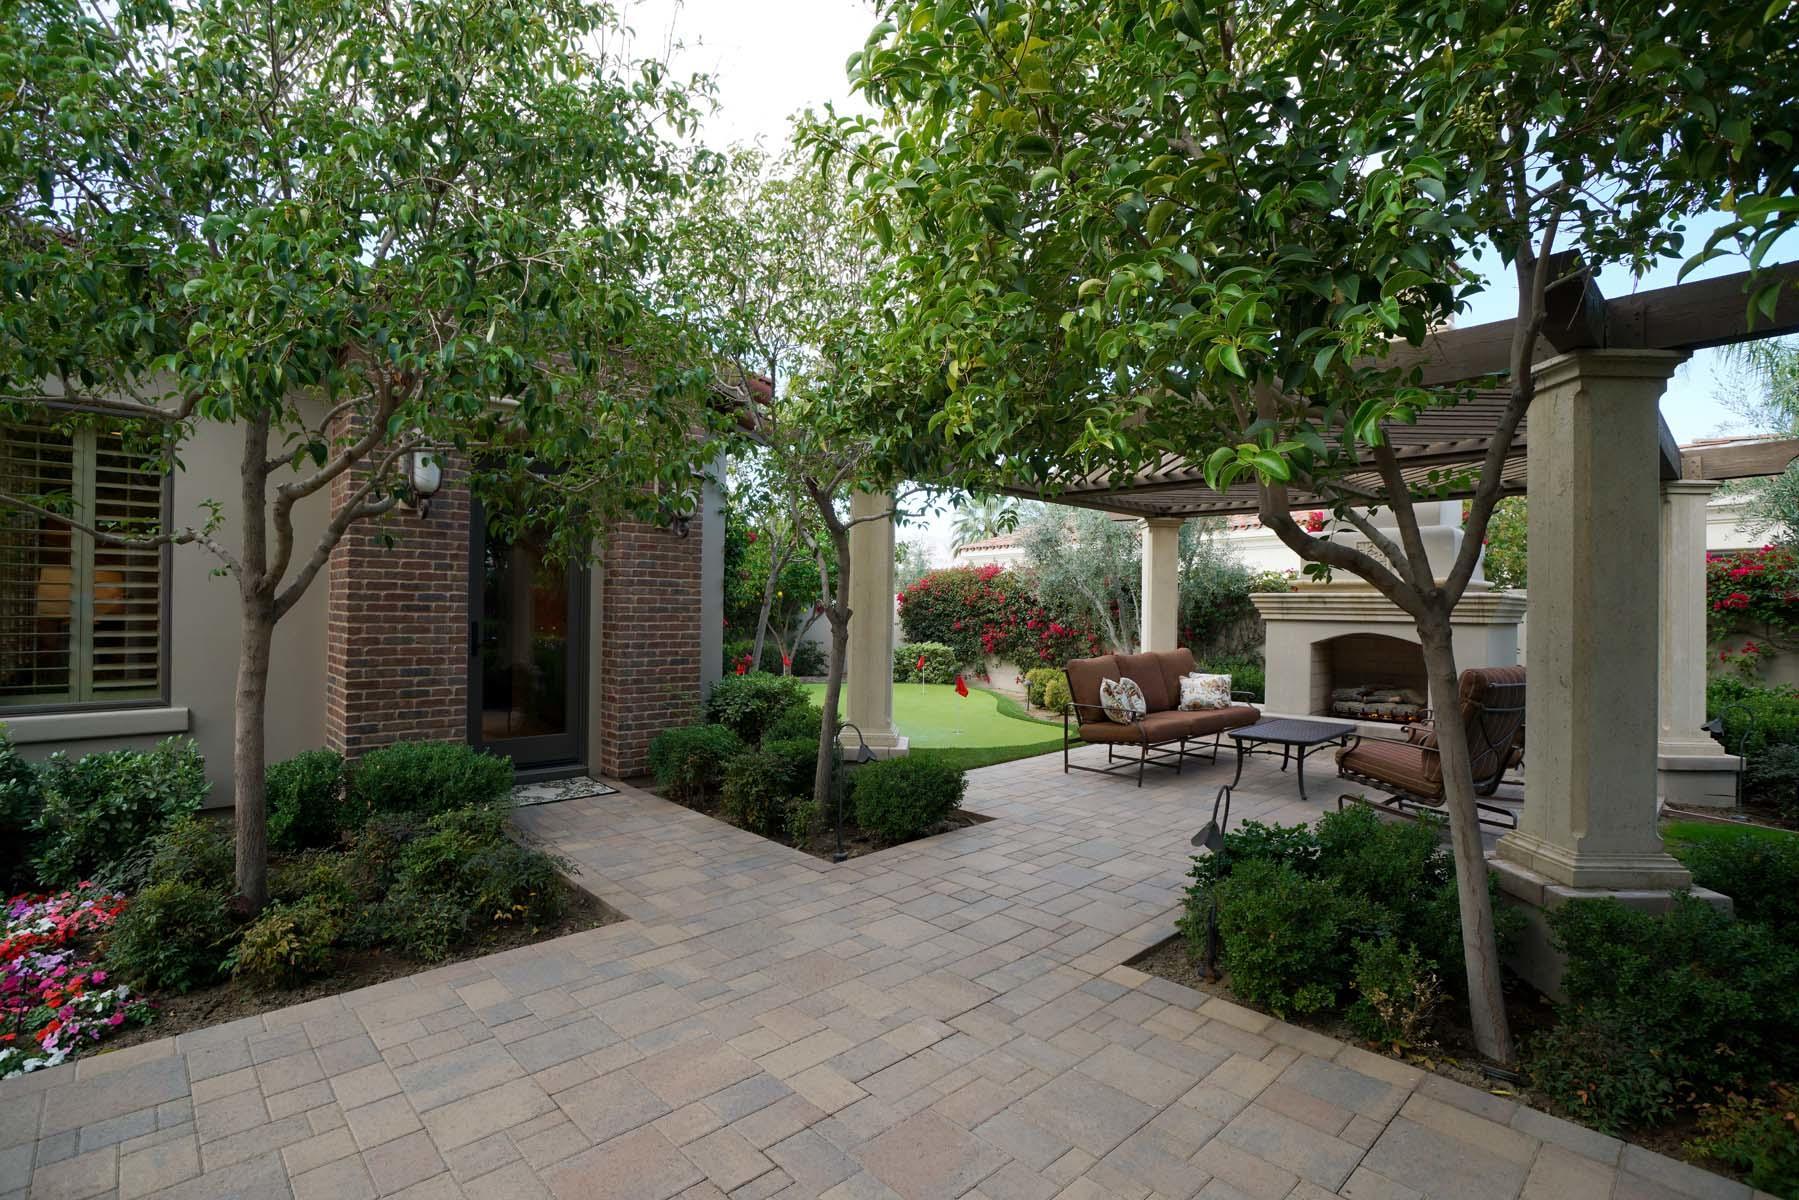 Photo of 76322 Via Uzzano, Indian Wells, CA 92210